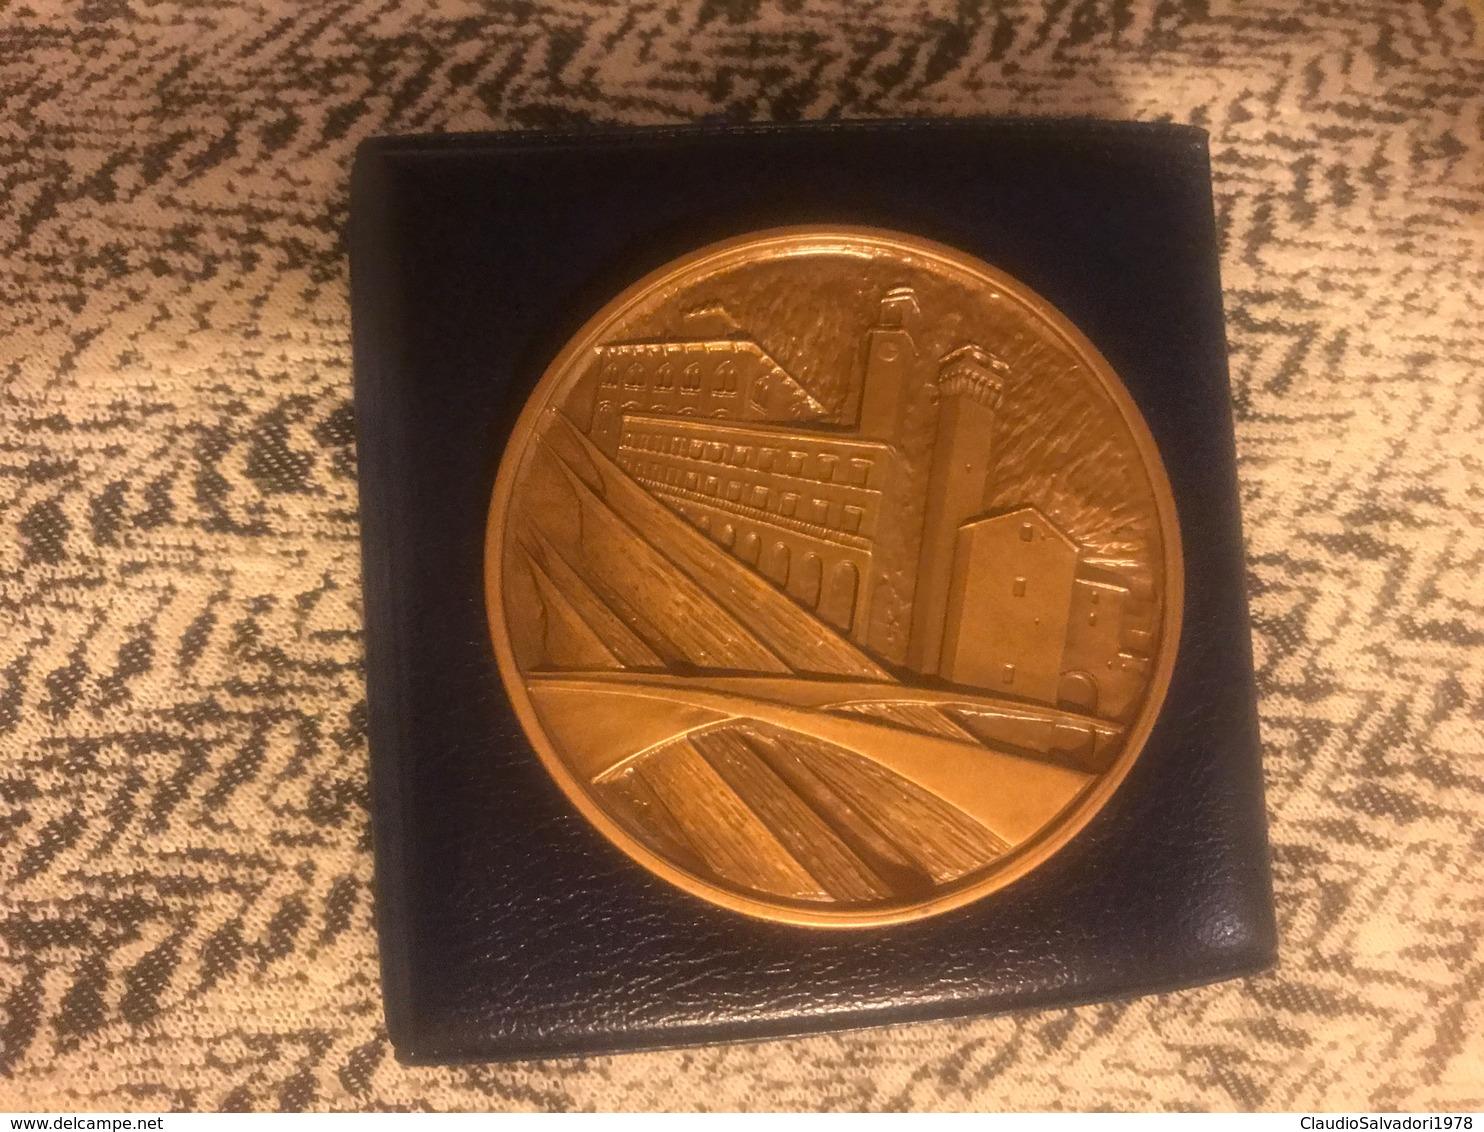 1988 Medaglia Grande Modulo In Bronzo Qsmaltata Regata Storica Di San Ranieri Pisa Amalfi Genova Venezia - Bronzes